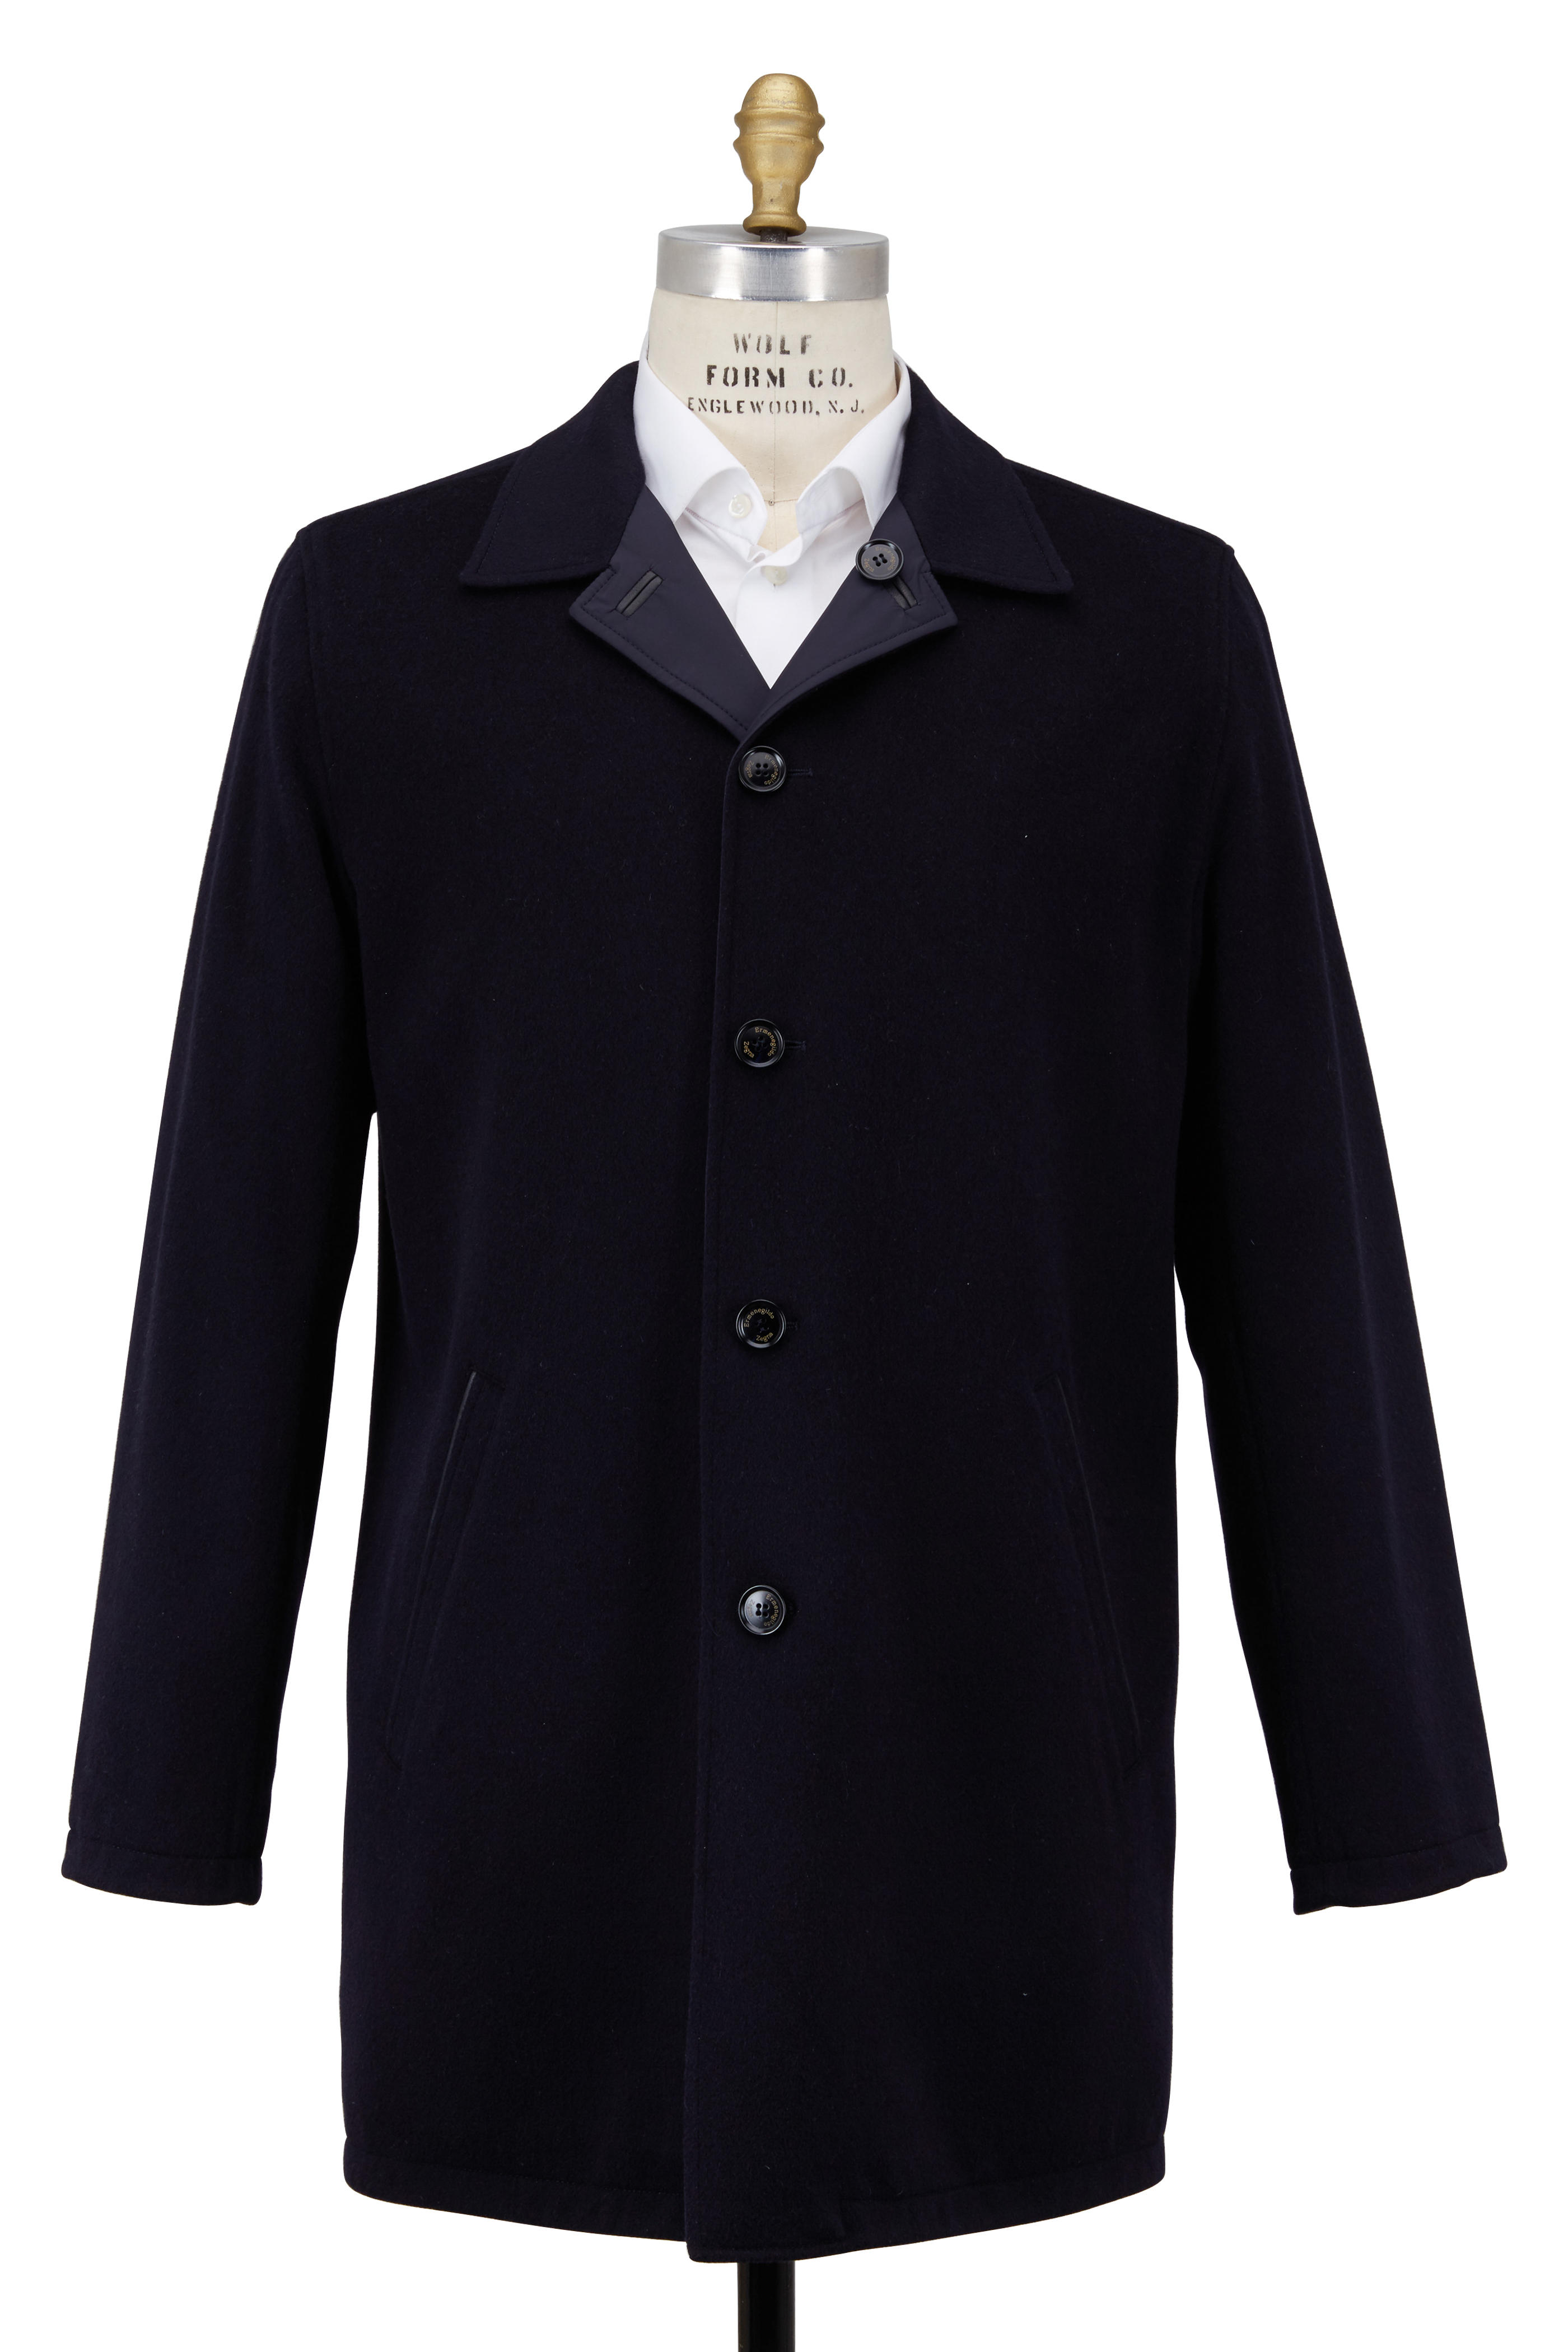 cddad8d4 Ermenegildo Zegna - Navy Blue Wool & Cashmere Reversible Top Coat ...